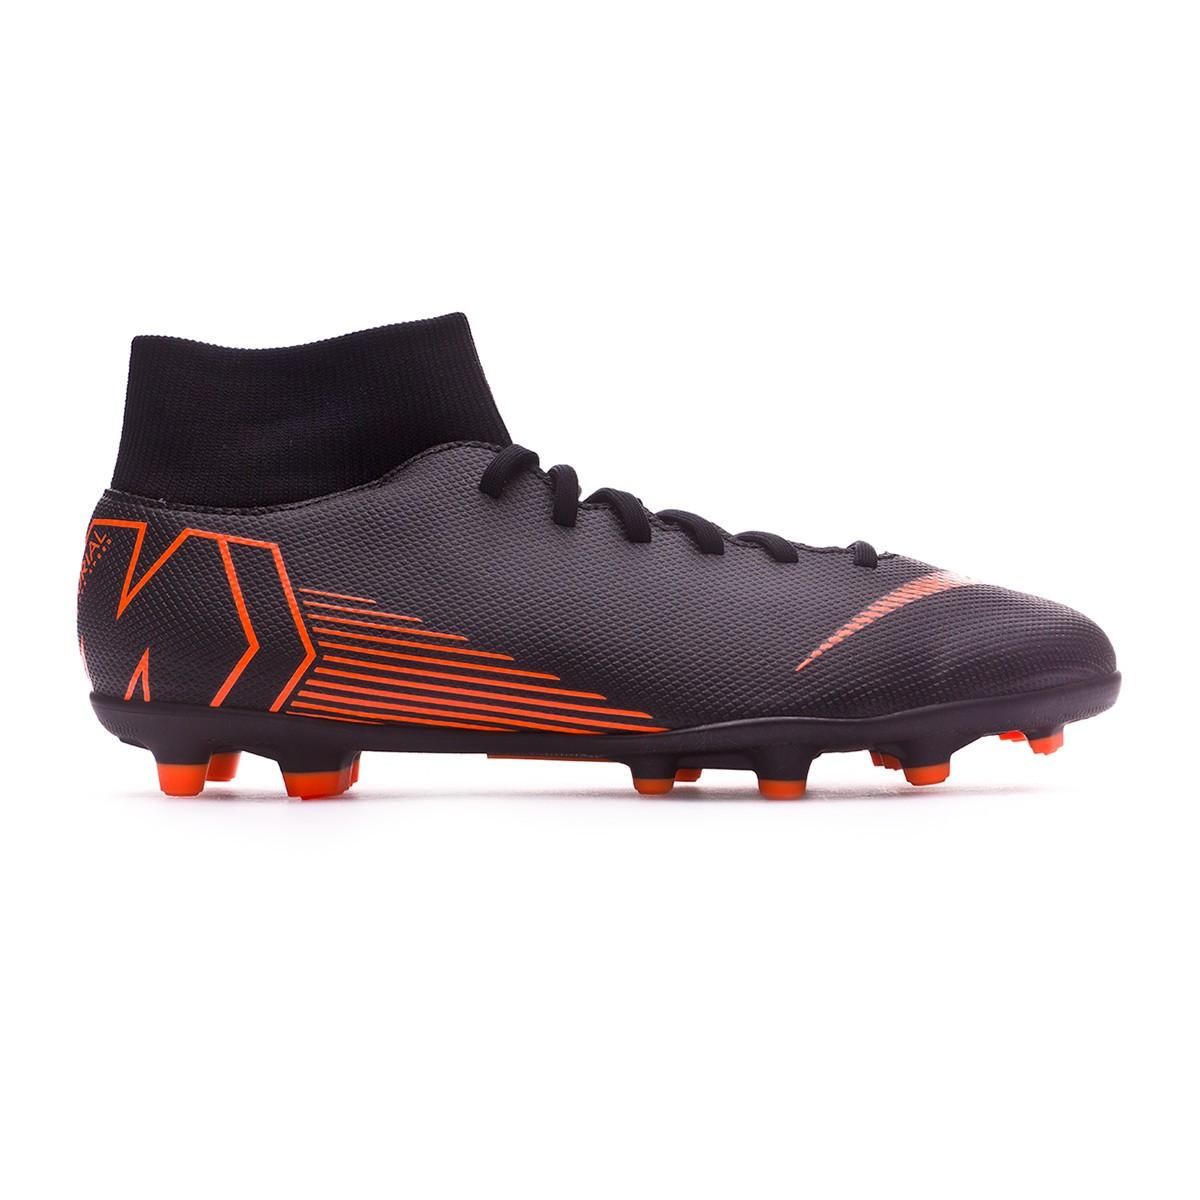 3185a6b4aaf8 Scarpe Nike Mercurial Superfly VI Club MG Black-Total orange-White - Negozio  di calcio Fútbol Emotion